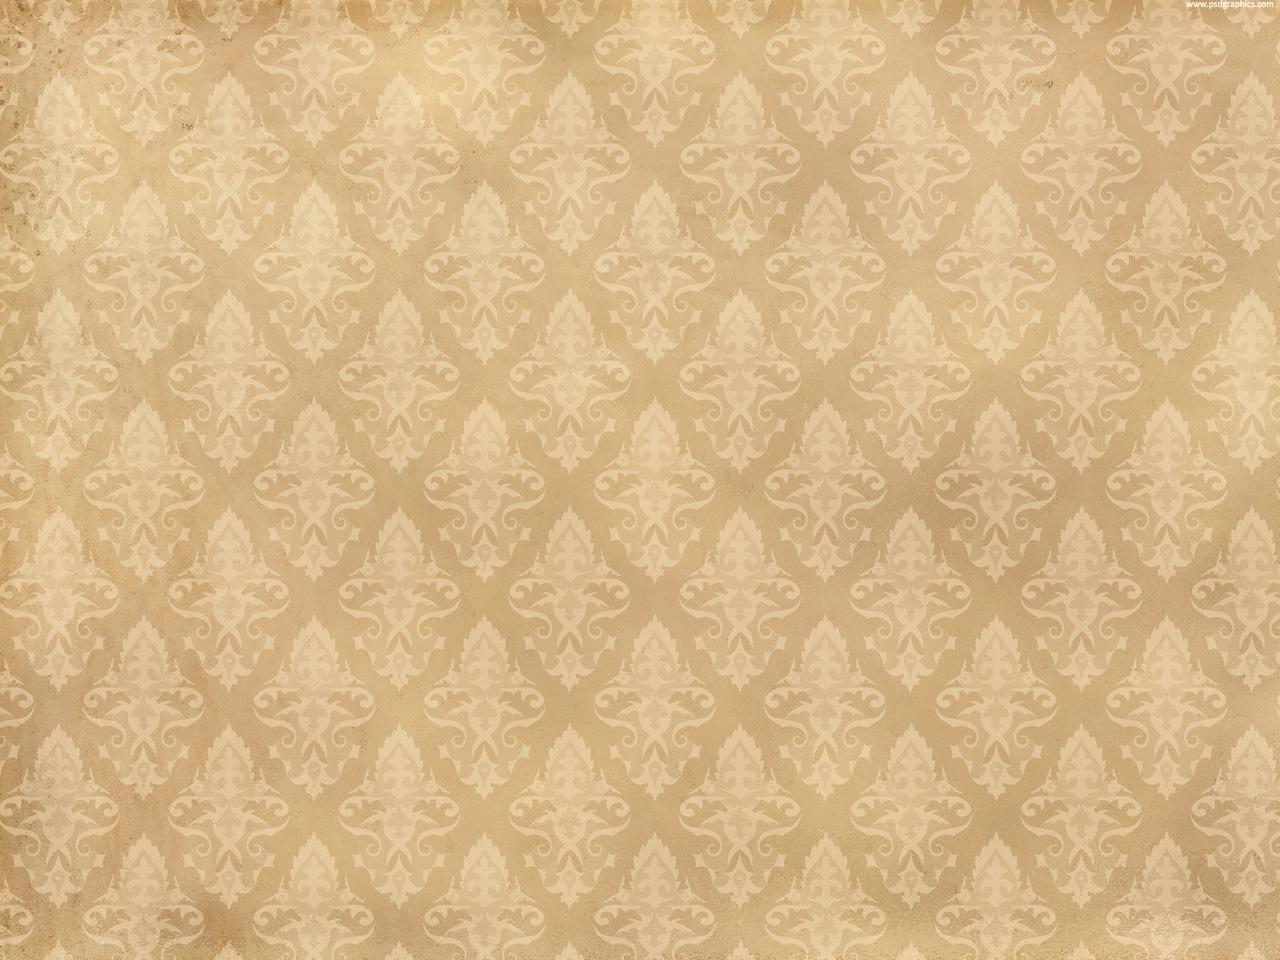 Medium size preview 1280x960px Brown vintage pattern 1280x960